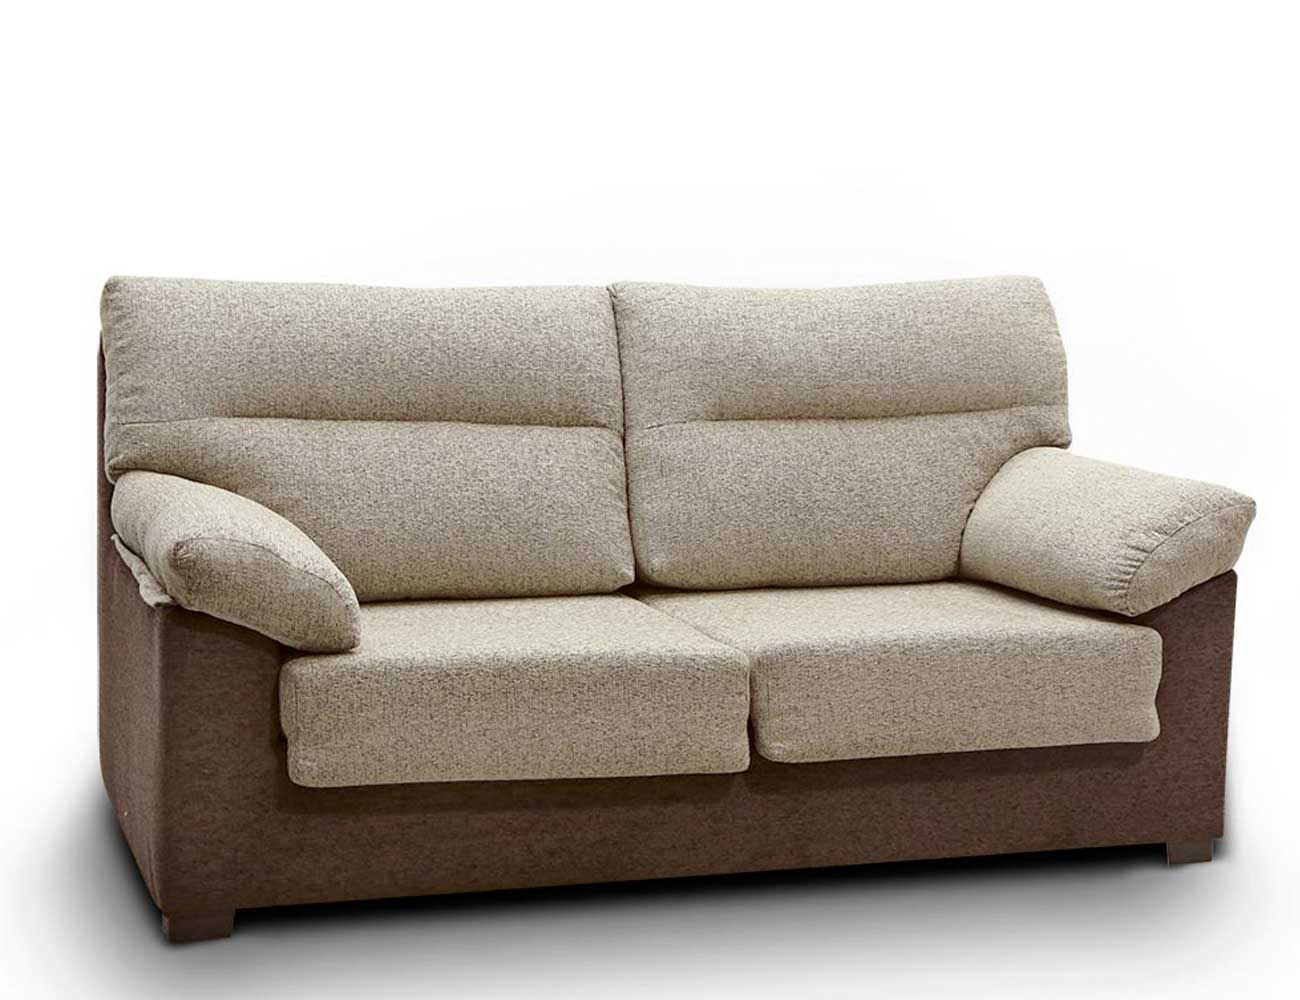 Sofa 3 plazas barato10